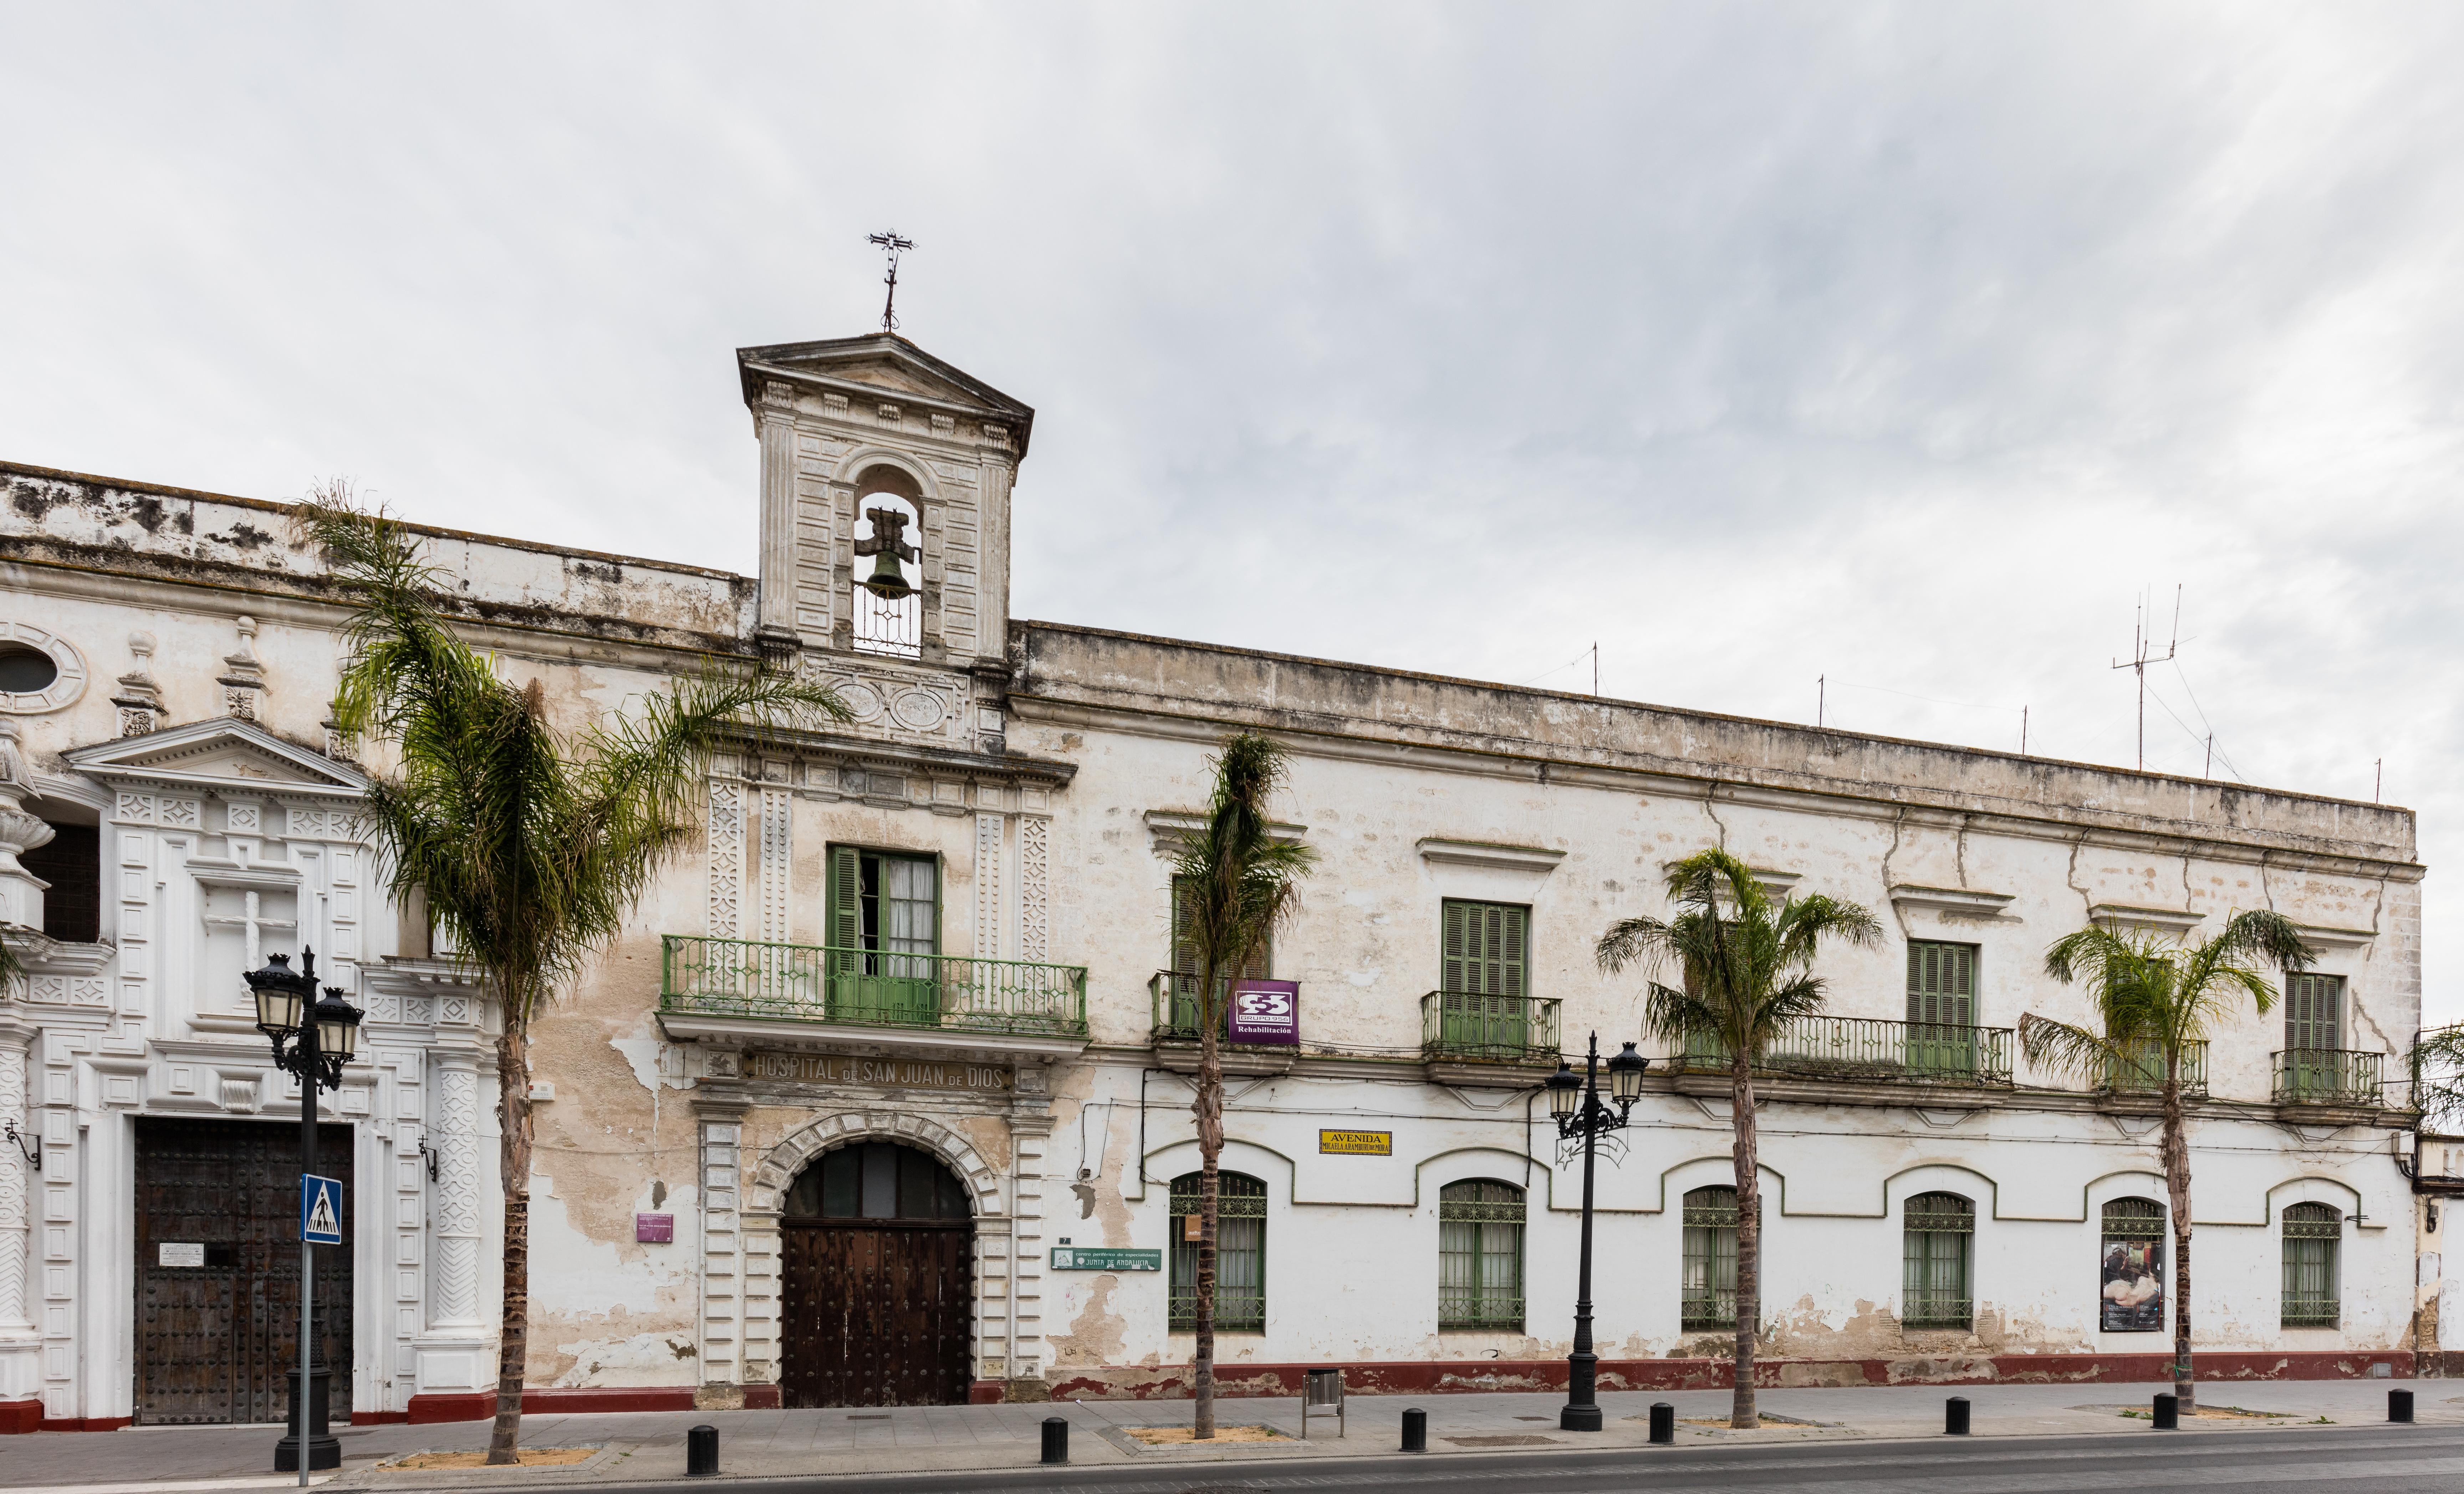 Archivo hospital san juan de dios el puerto de santa mar a espa a 2015 12 08 dd 09 jpg - Tren el puerto de santa maria madrid ...